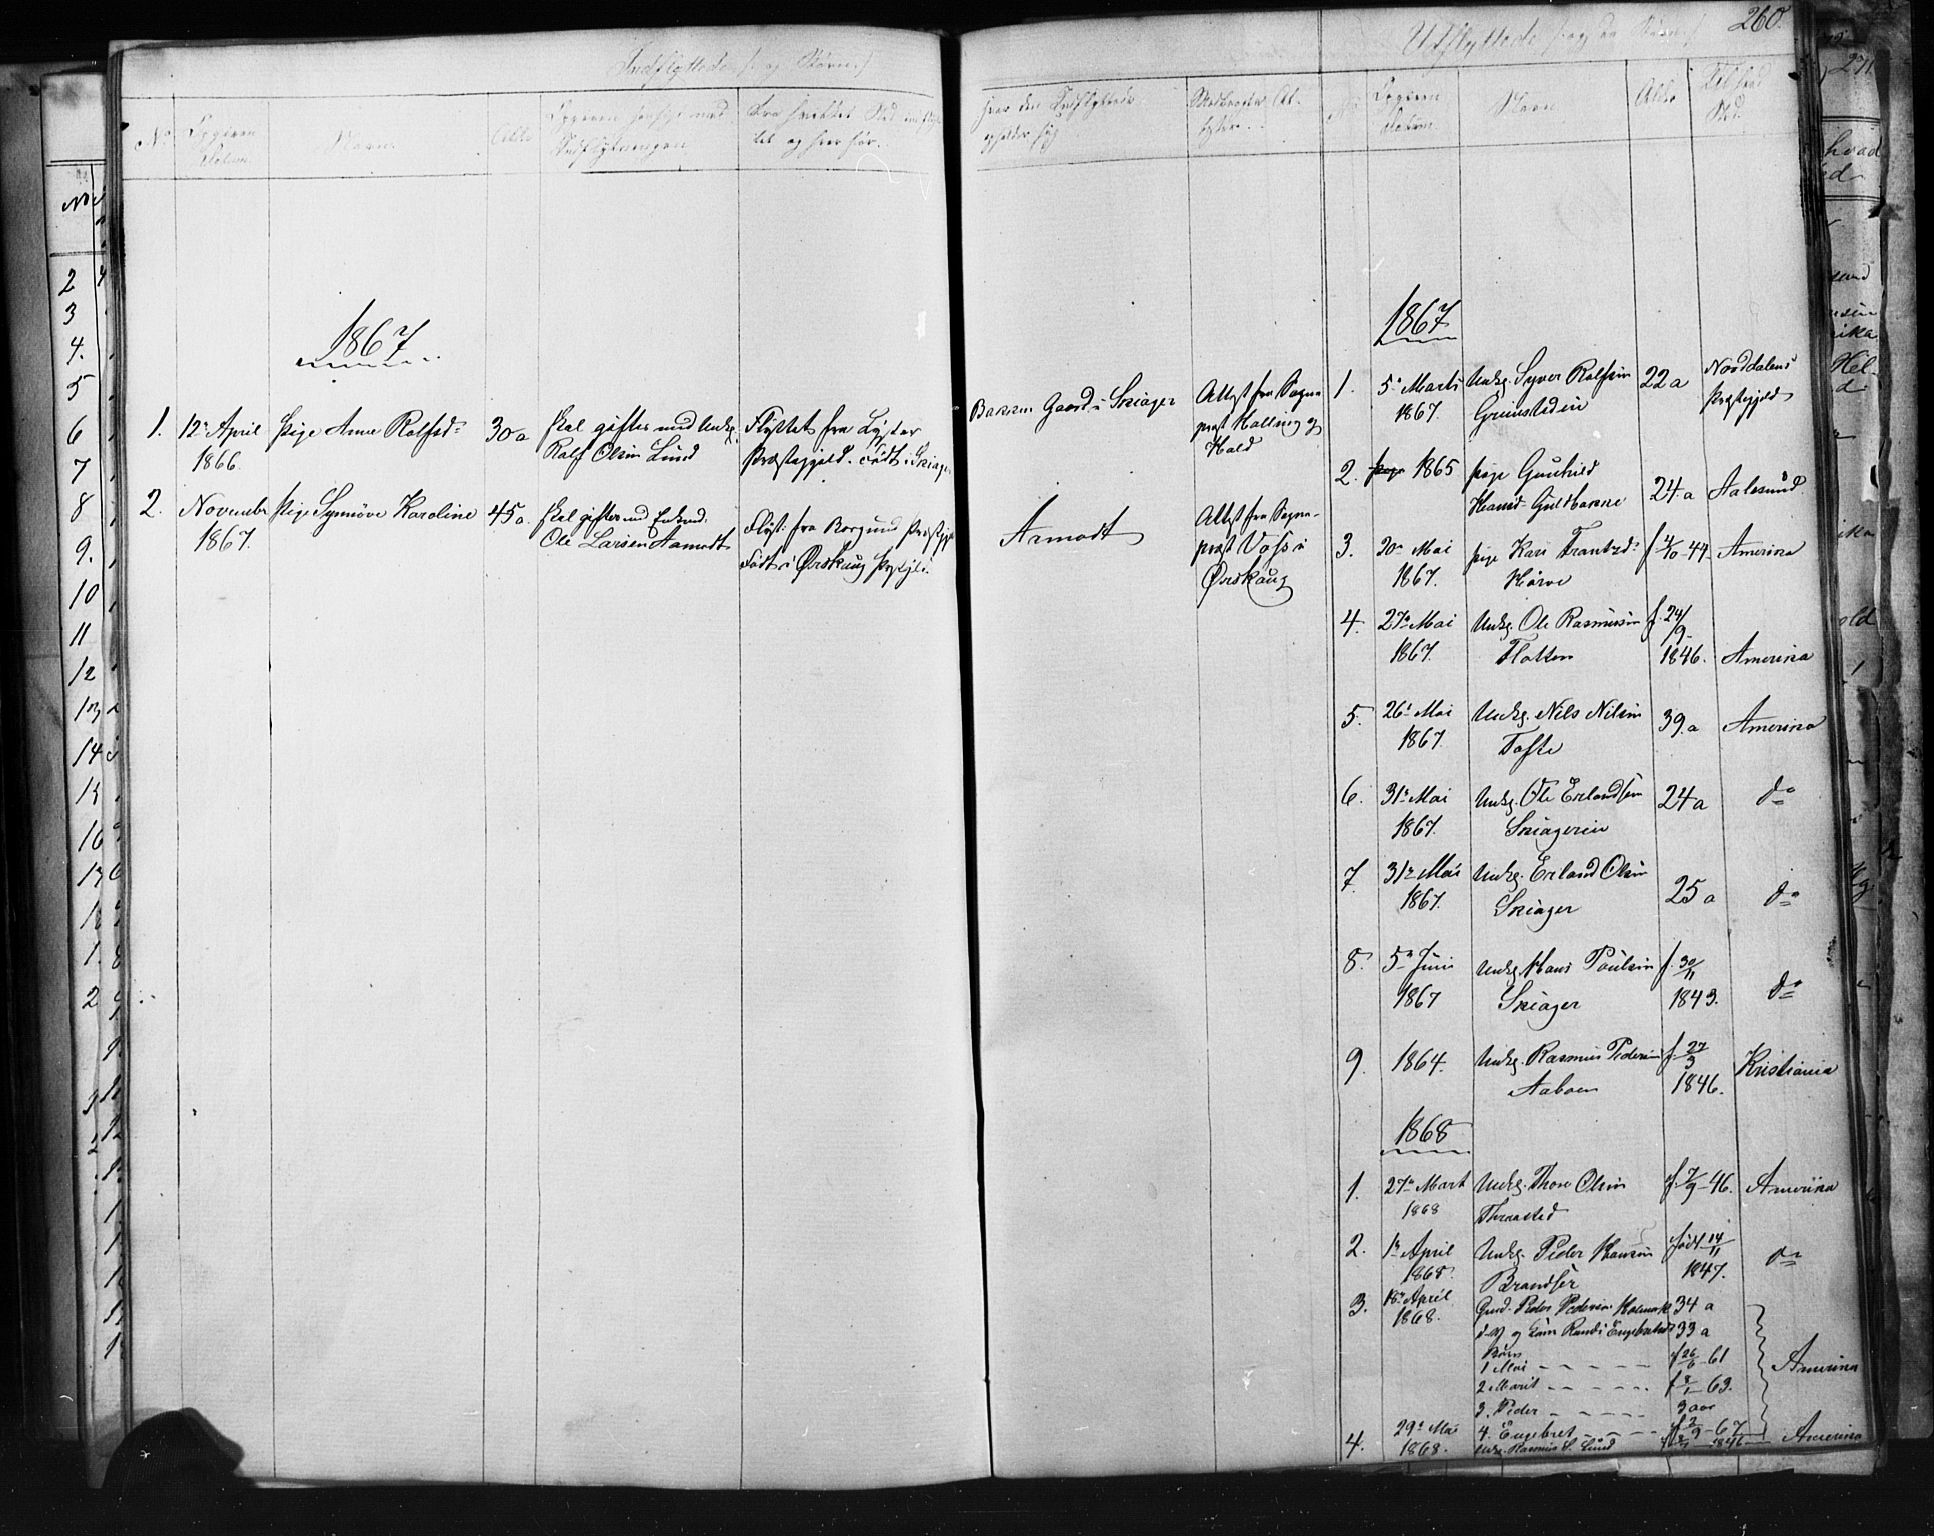 SAH, Skjåk prestekontor, Klokkerbok nr. 1, 1865-1893, s. 260